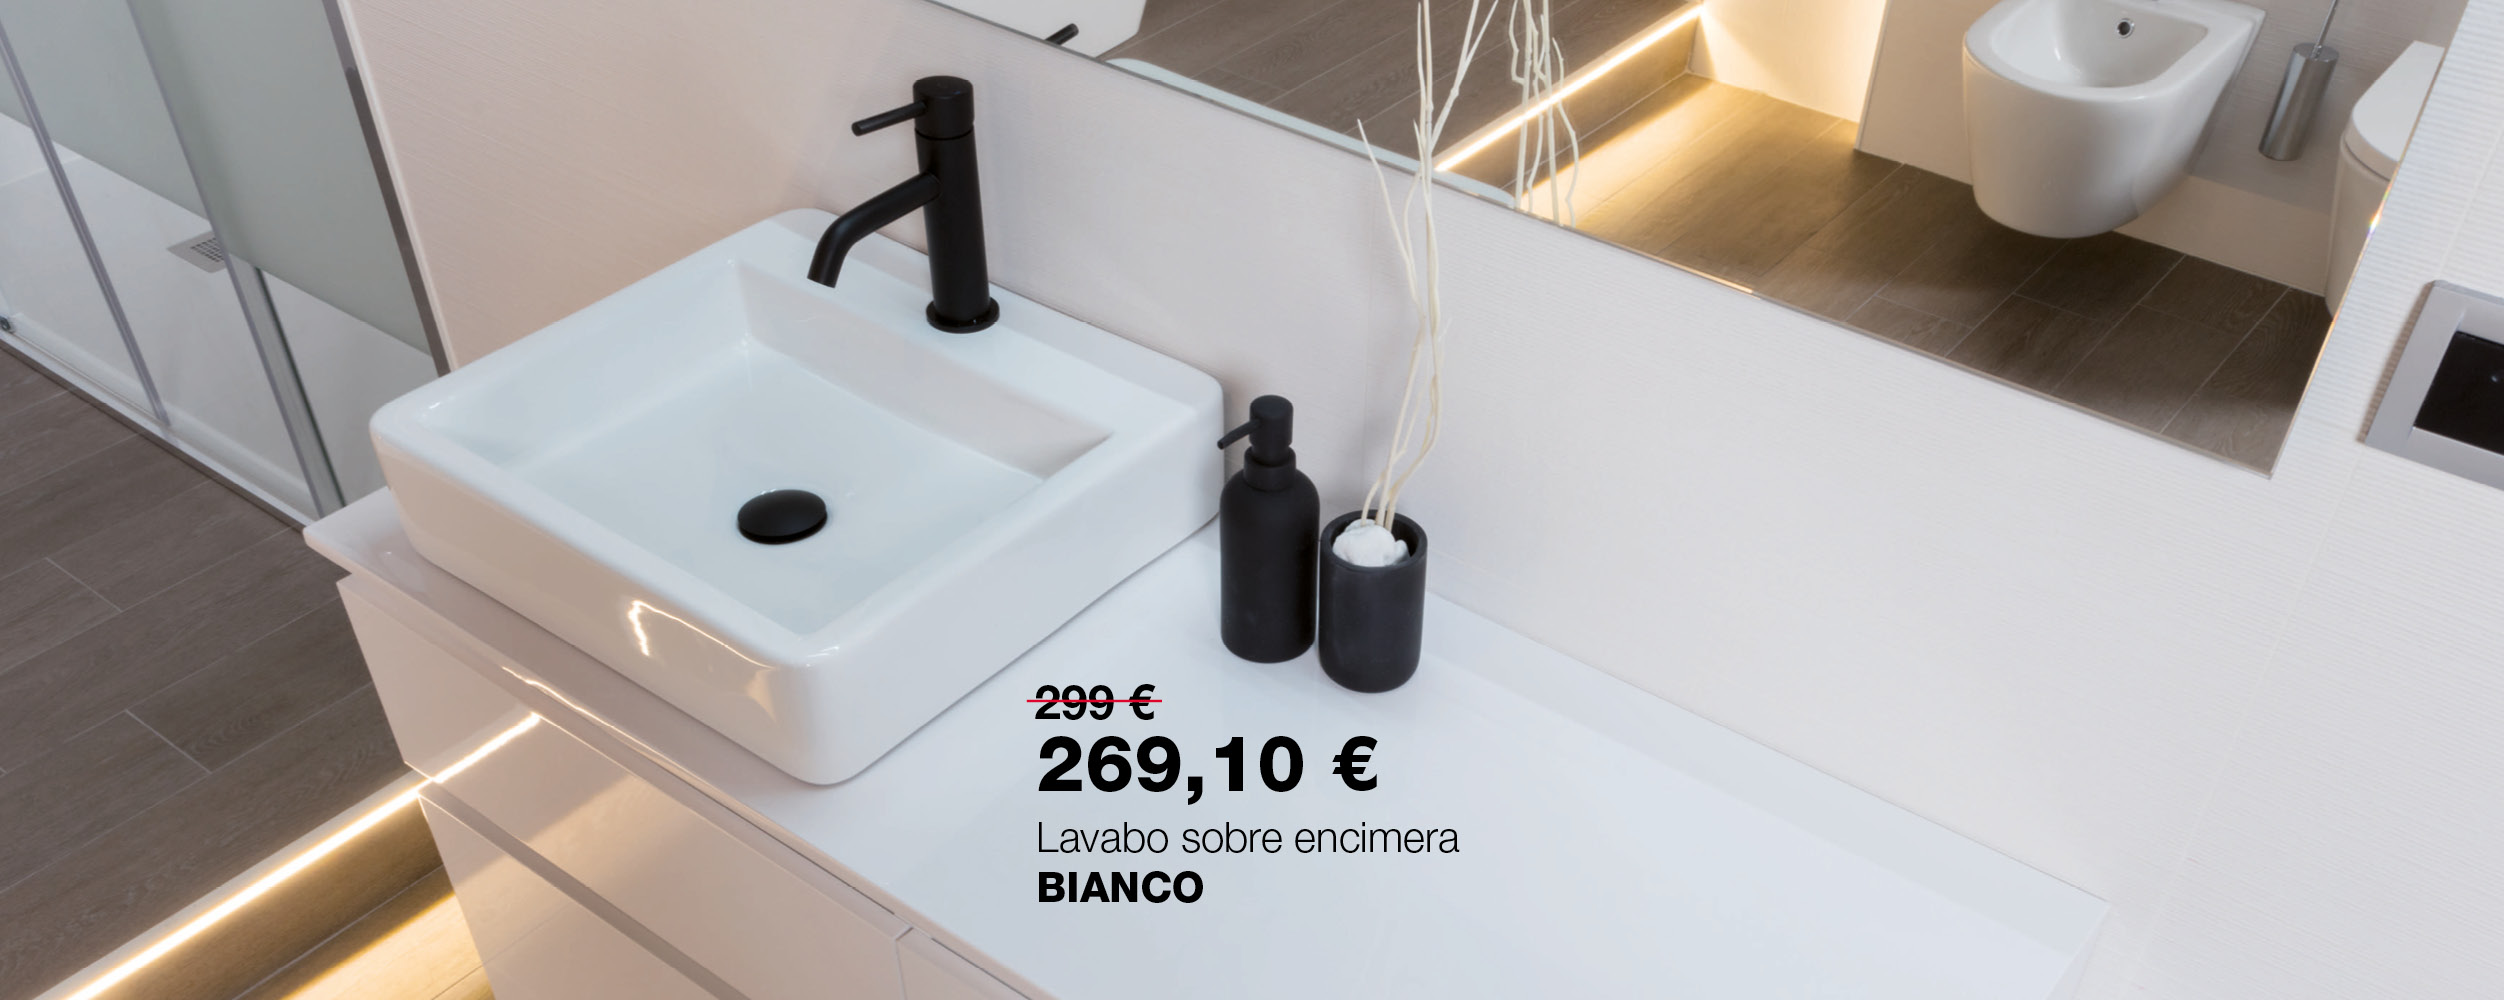 Lavabo sobre encimera BIANCO